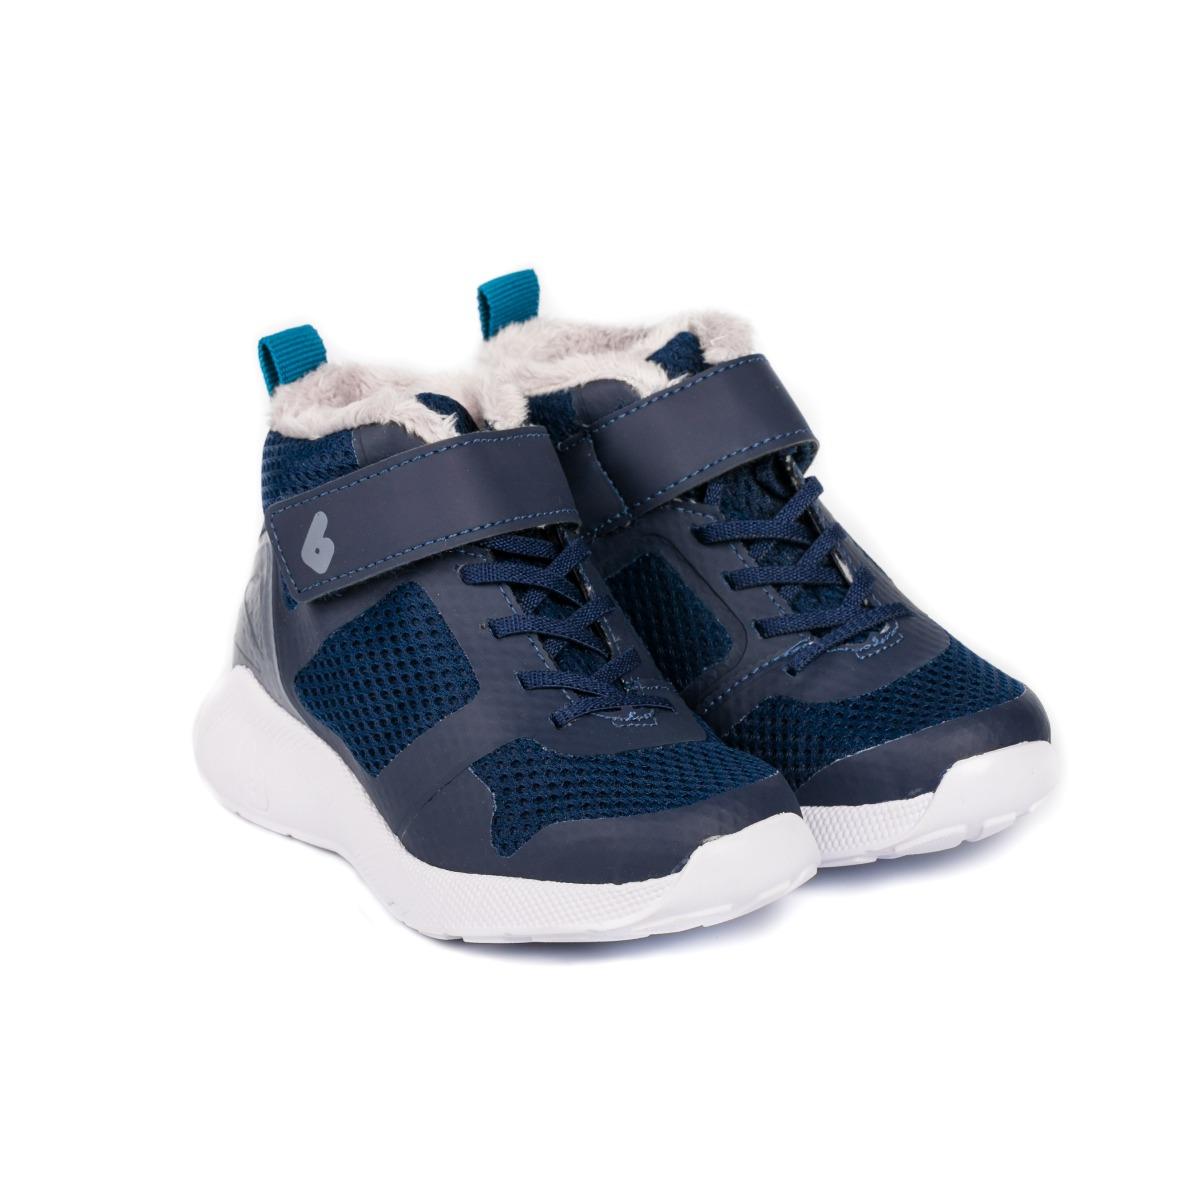 Ghete cu blanita Bibi Shoes Evolution Naval